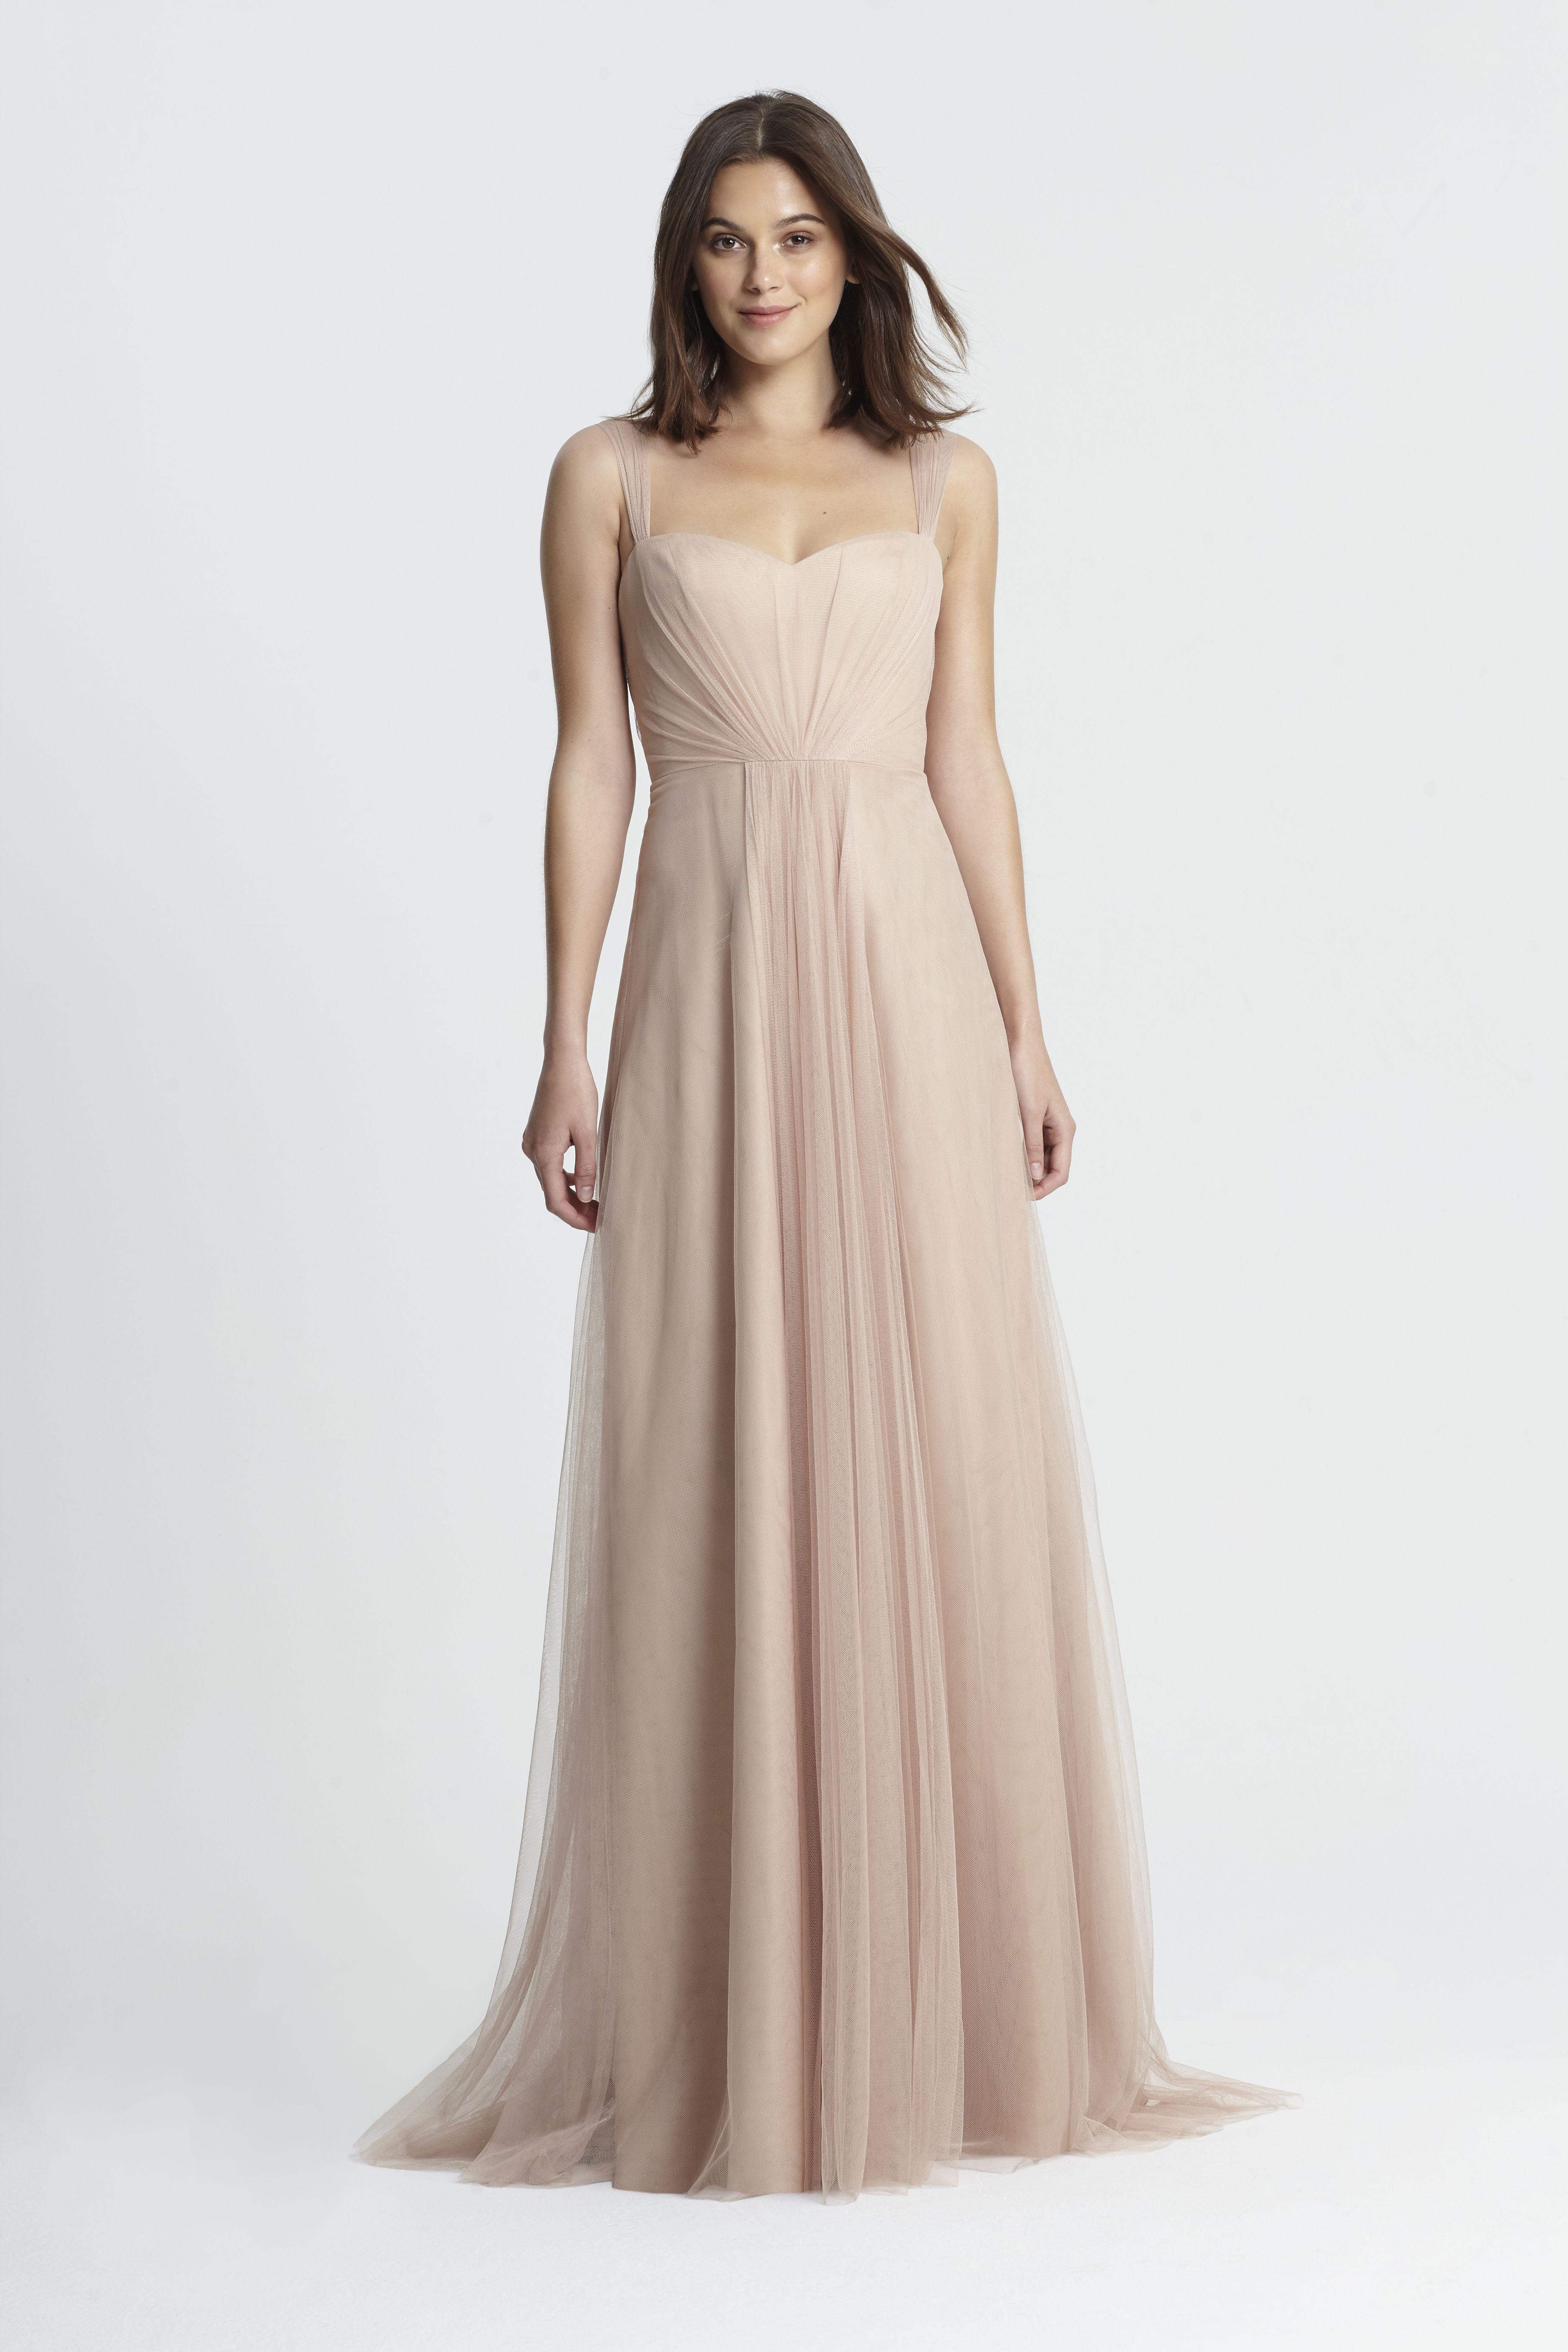 b6cc04dc149 450370 front bamboo. 450370 front bamboo Spring Bridesmaid Dresses ...